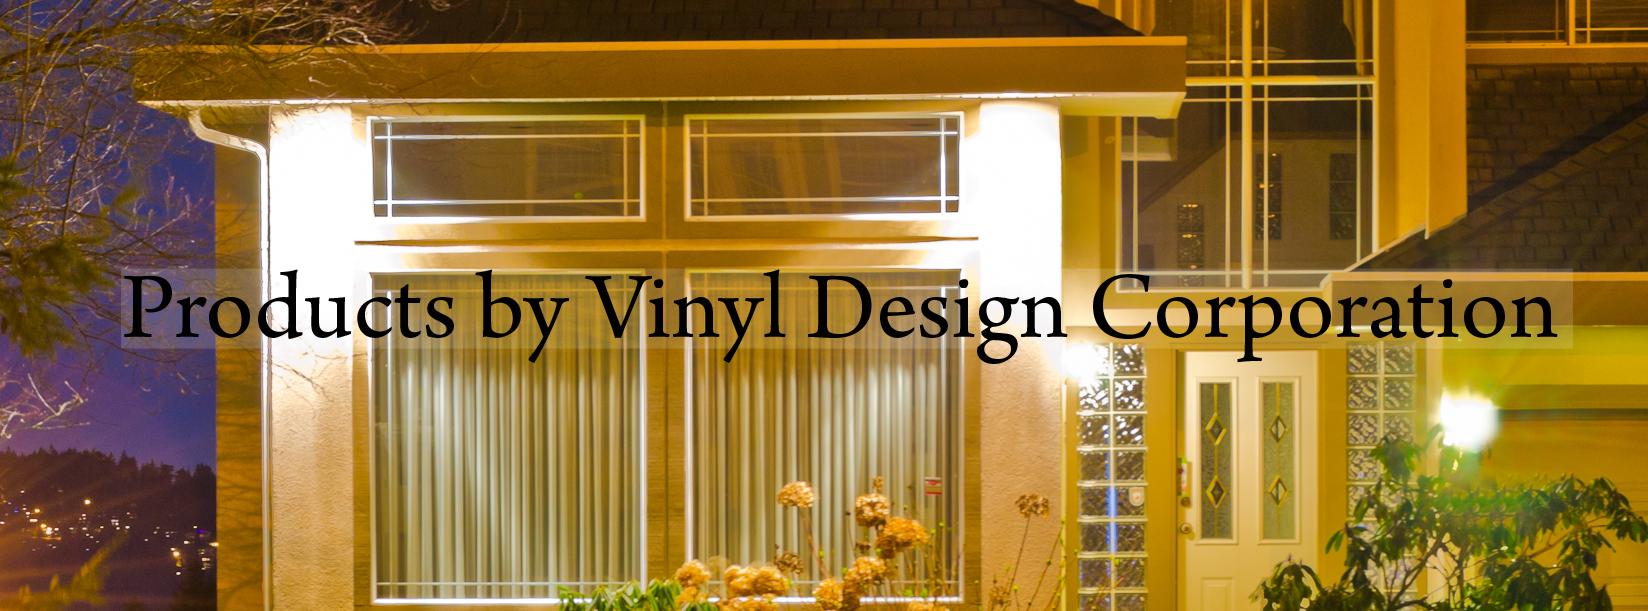 Vinyl Design Products